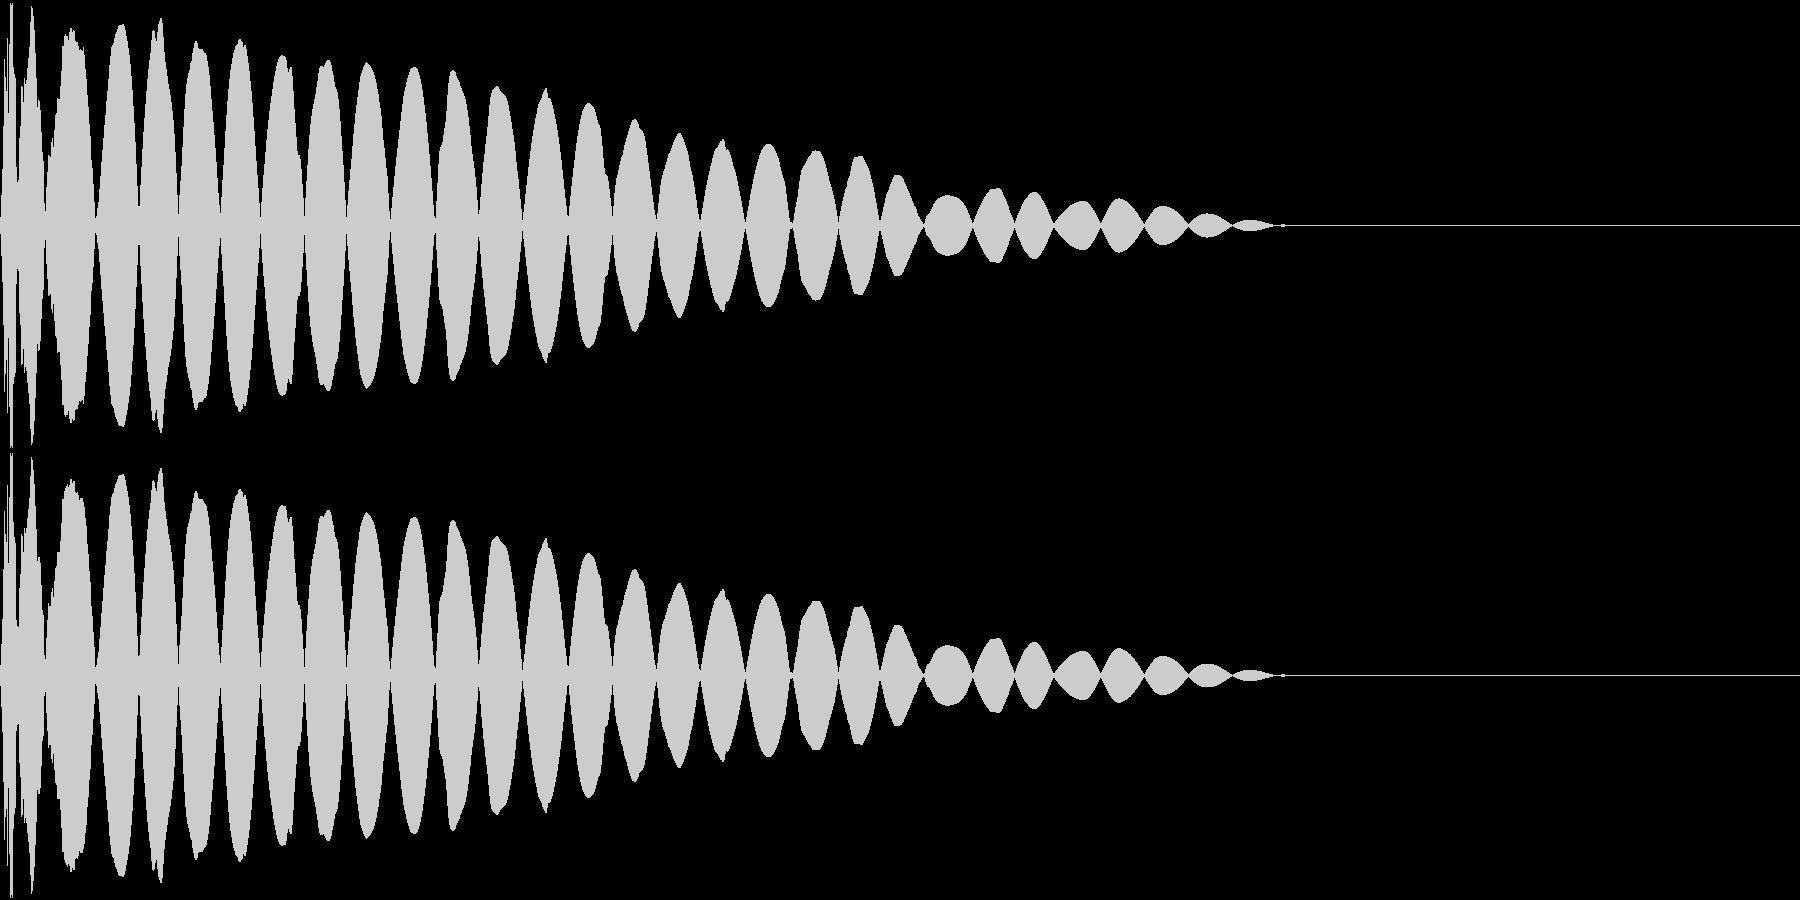 DTM Kick 94 オリジナル音源の未再生の波形